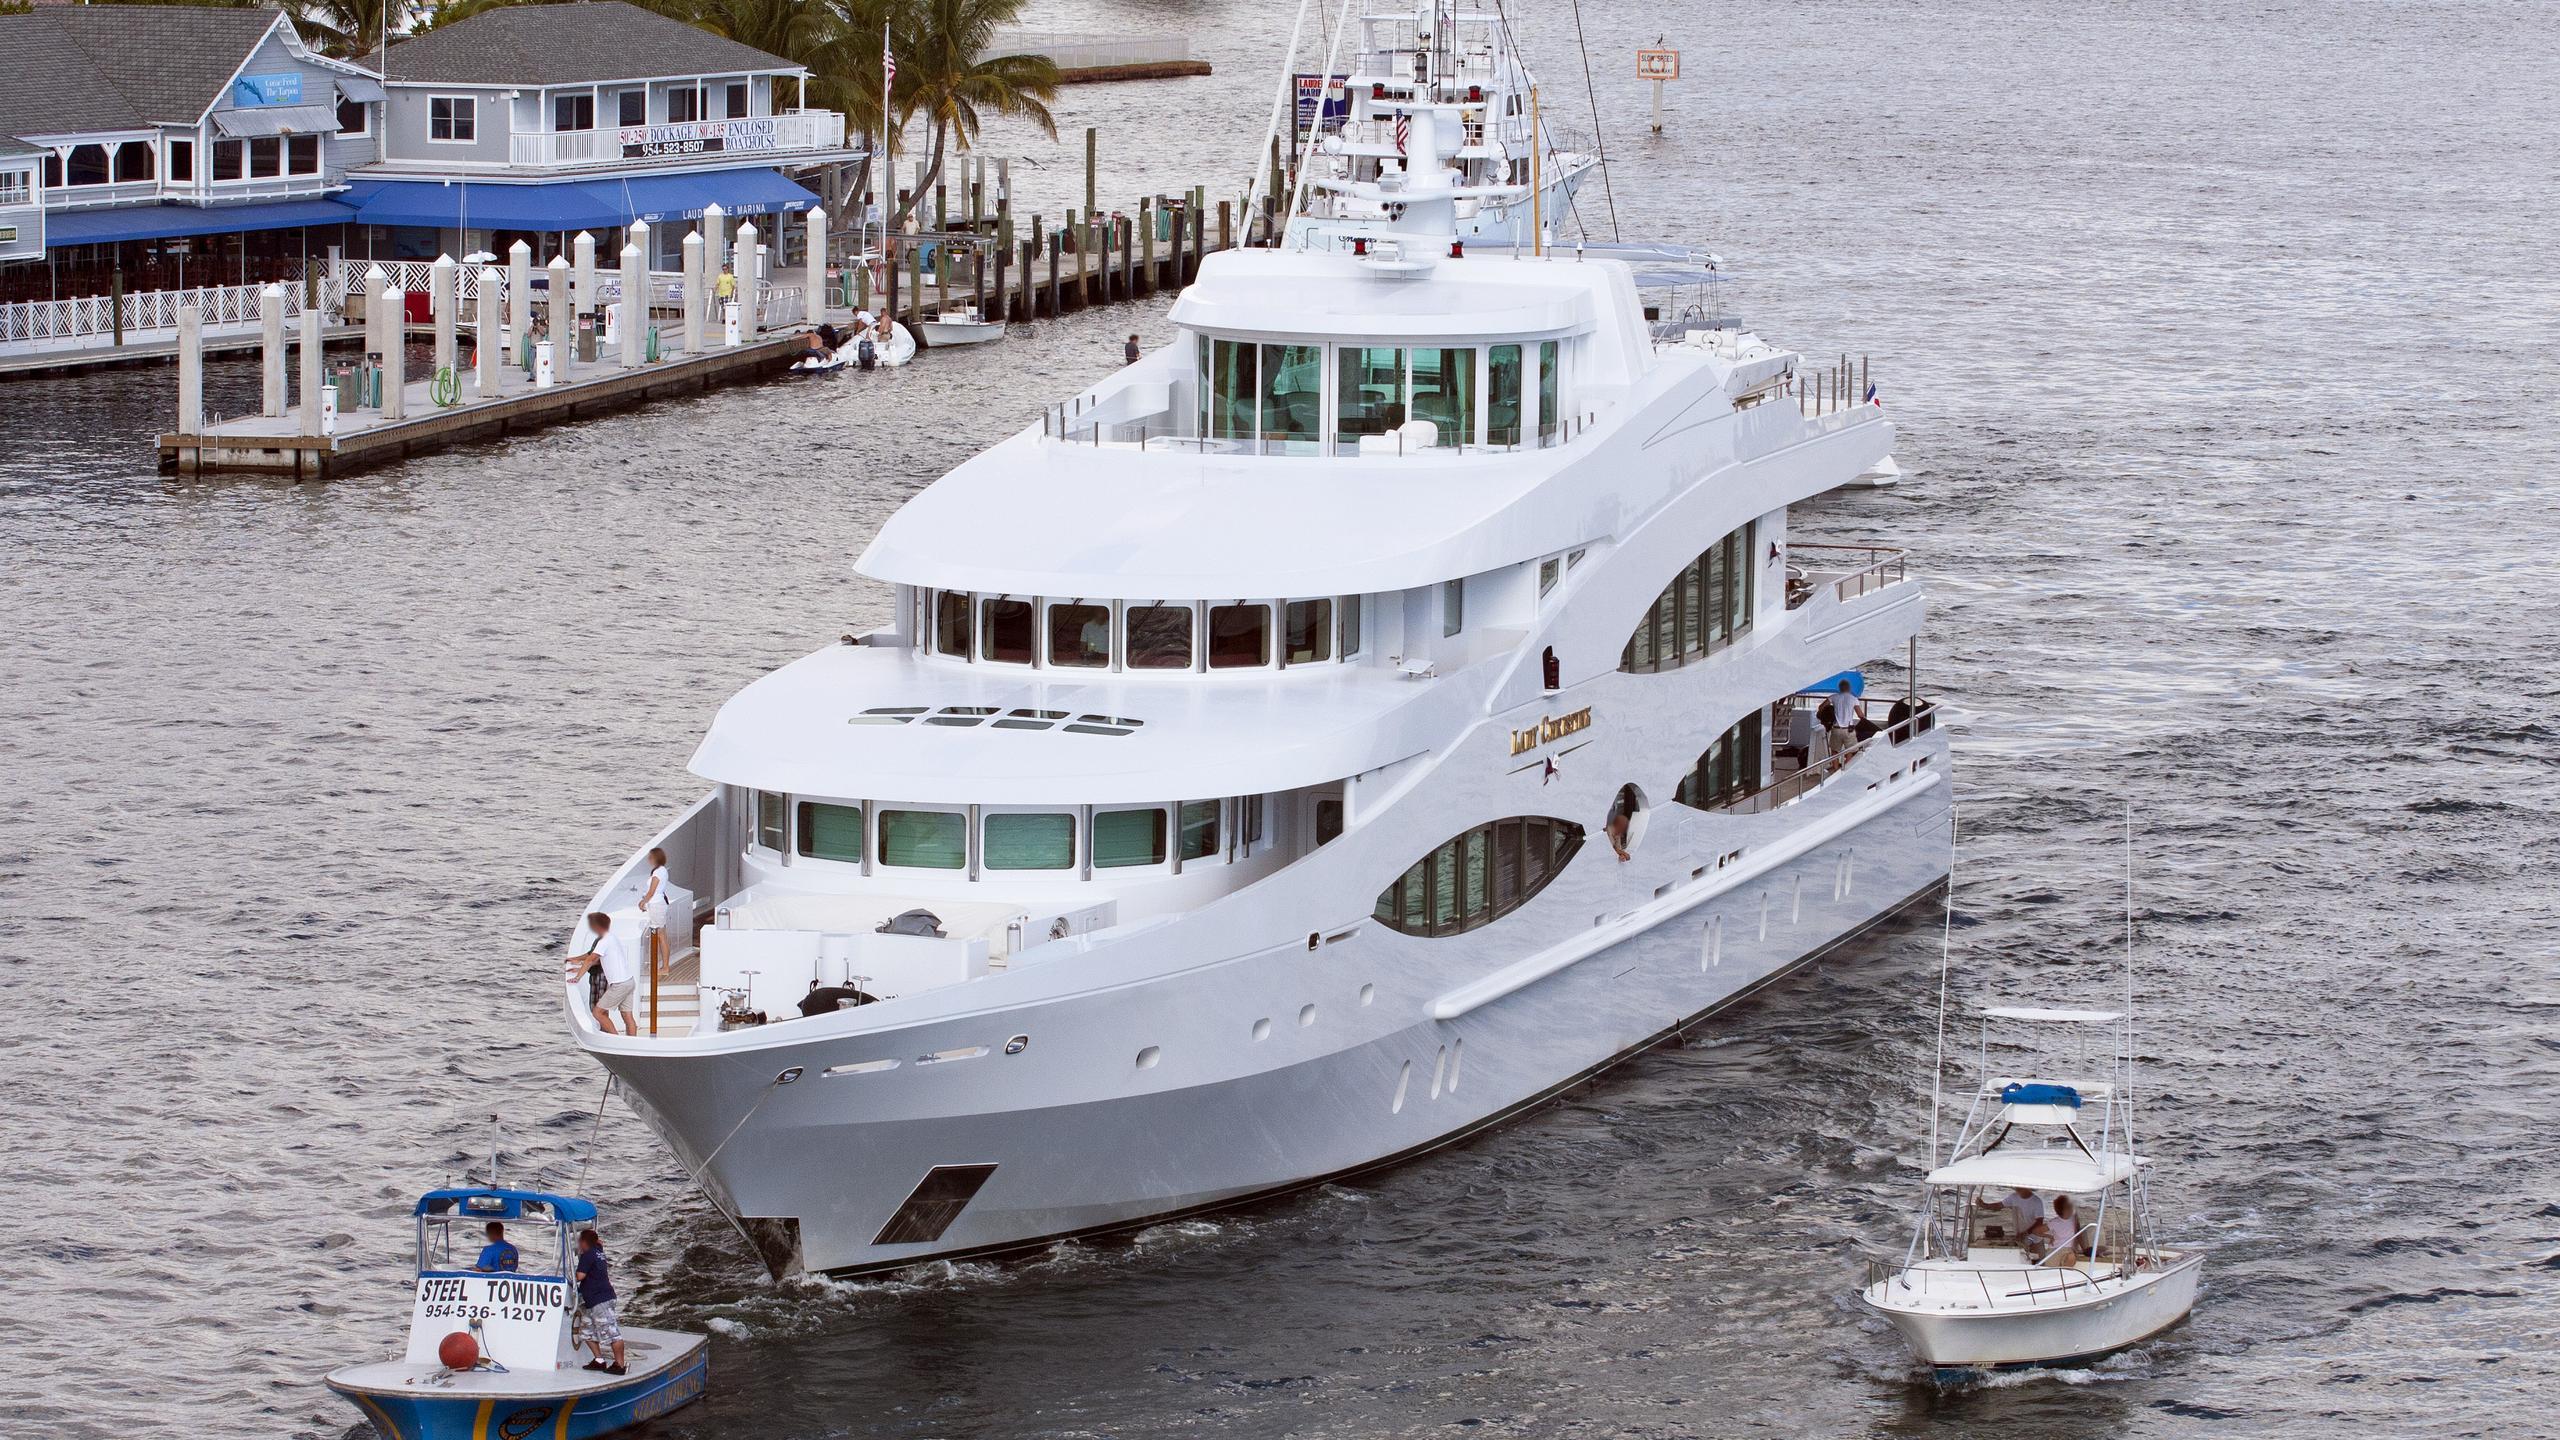 queen-mavia-motor-yacht-oceanco-2001-56m-bow